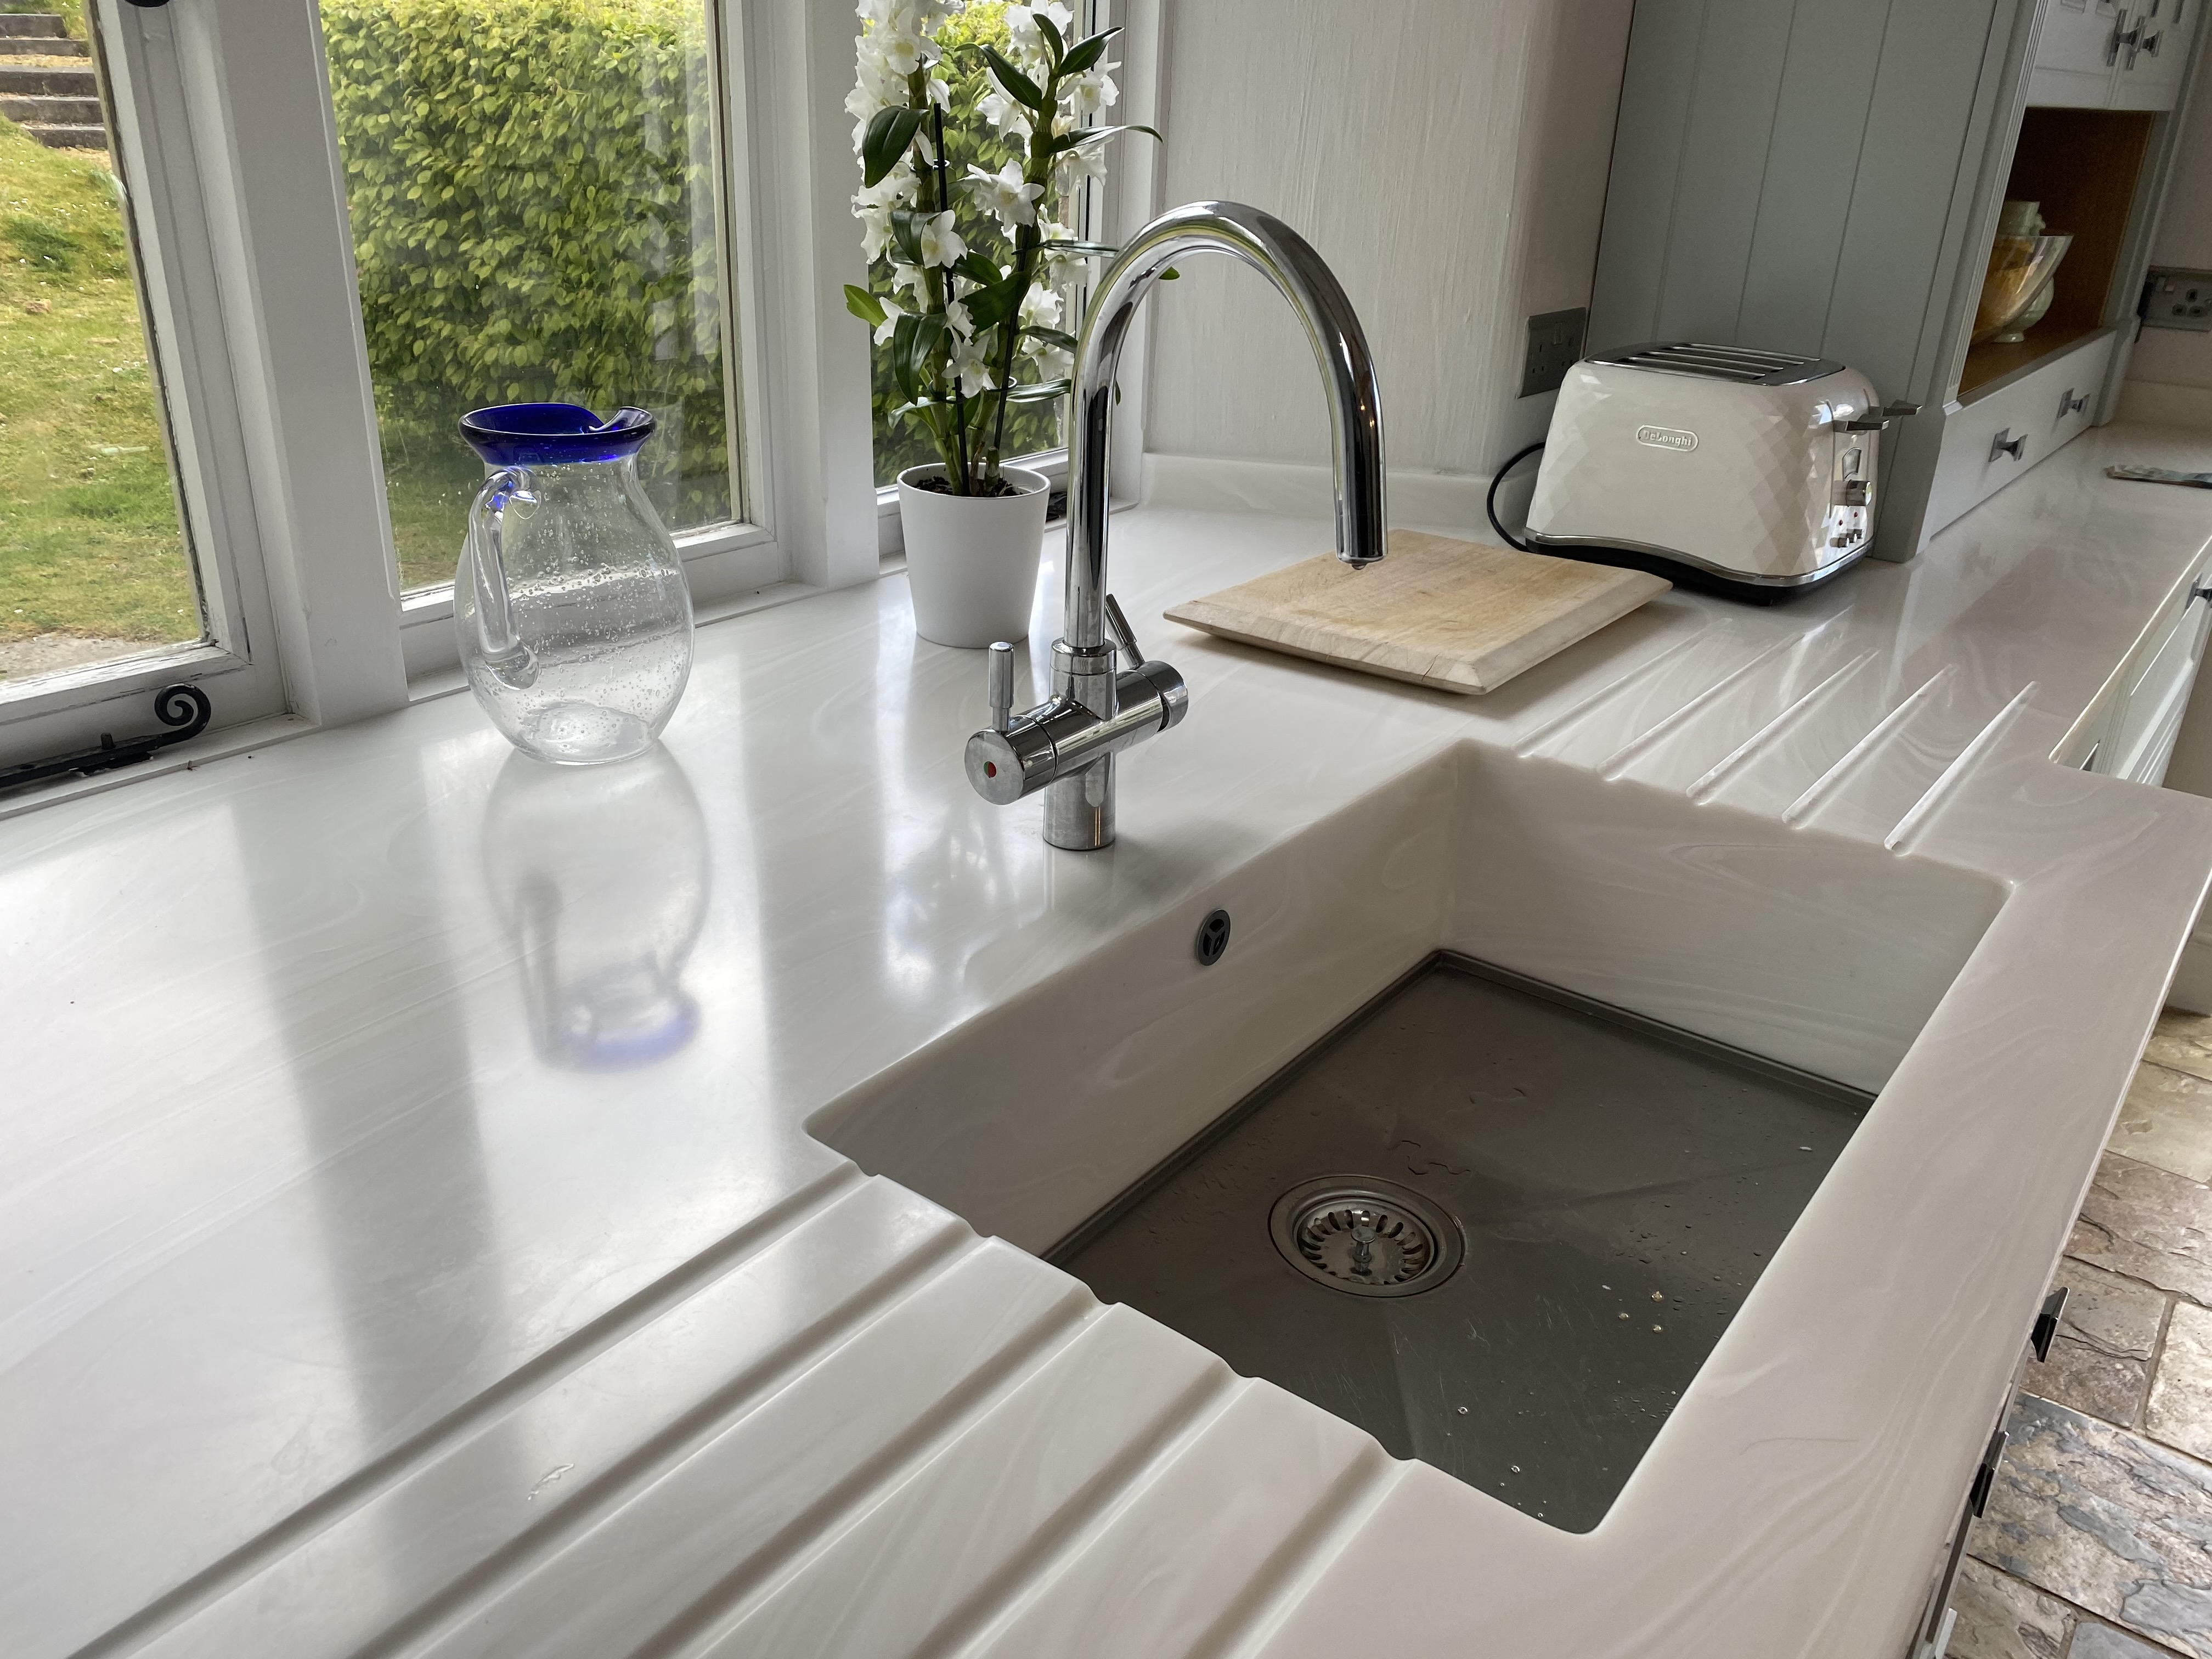 corian sinks built in drainer grooves